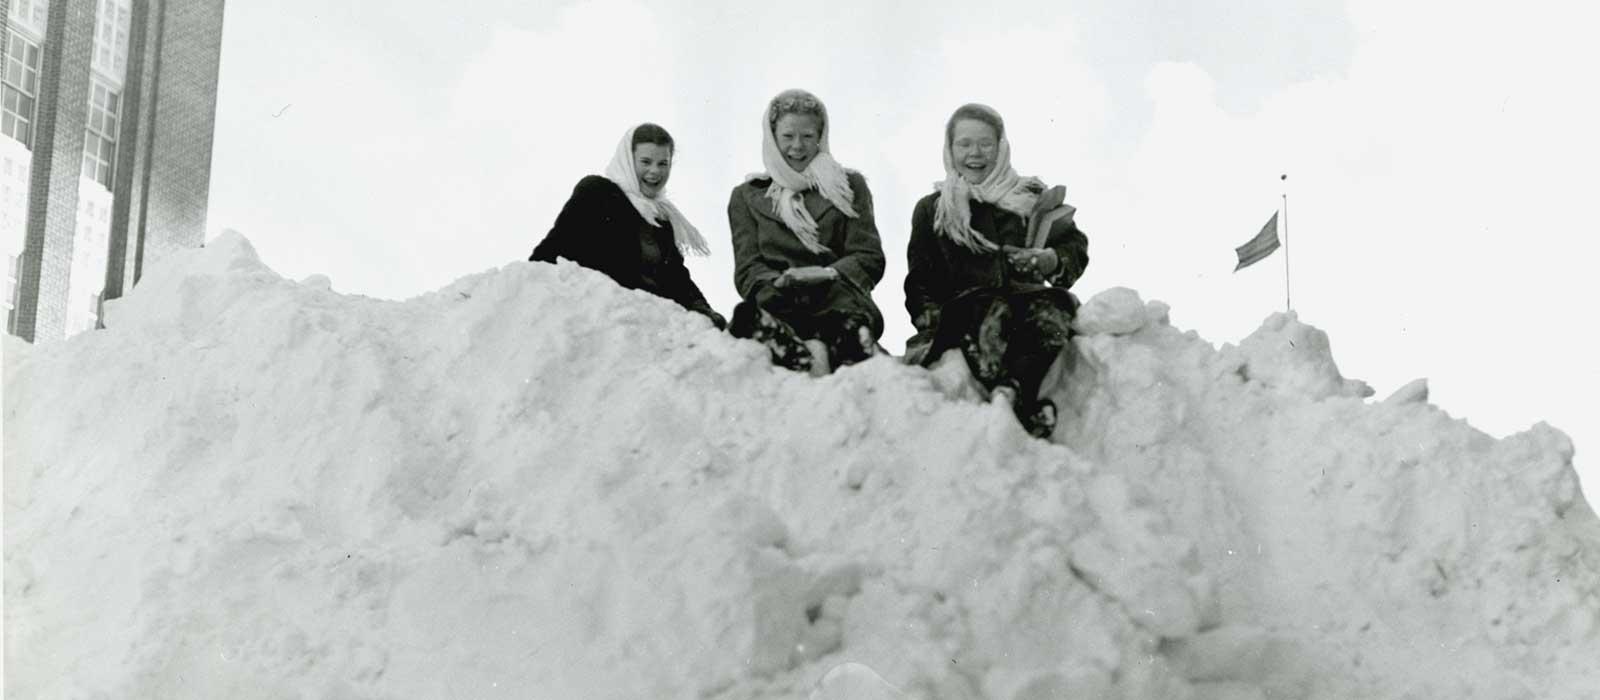 Girls on Snow Bank - Winter